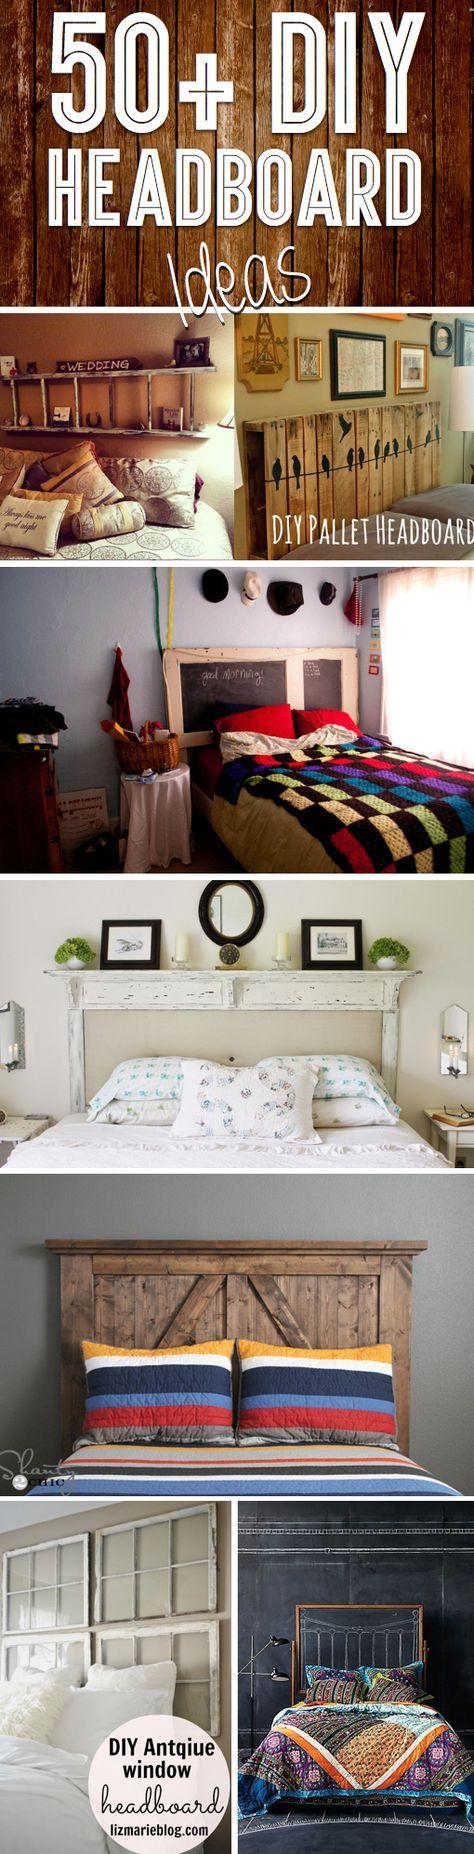 Ideas To Spice Up Bedroom | Carpetcleaningvirginia.com